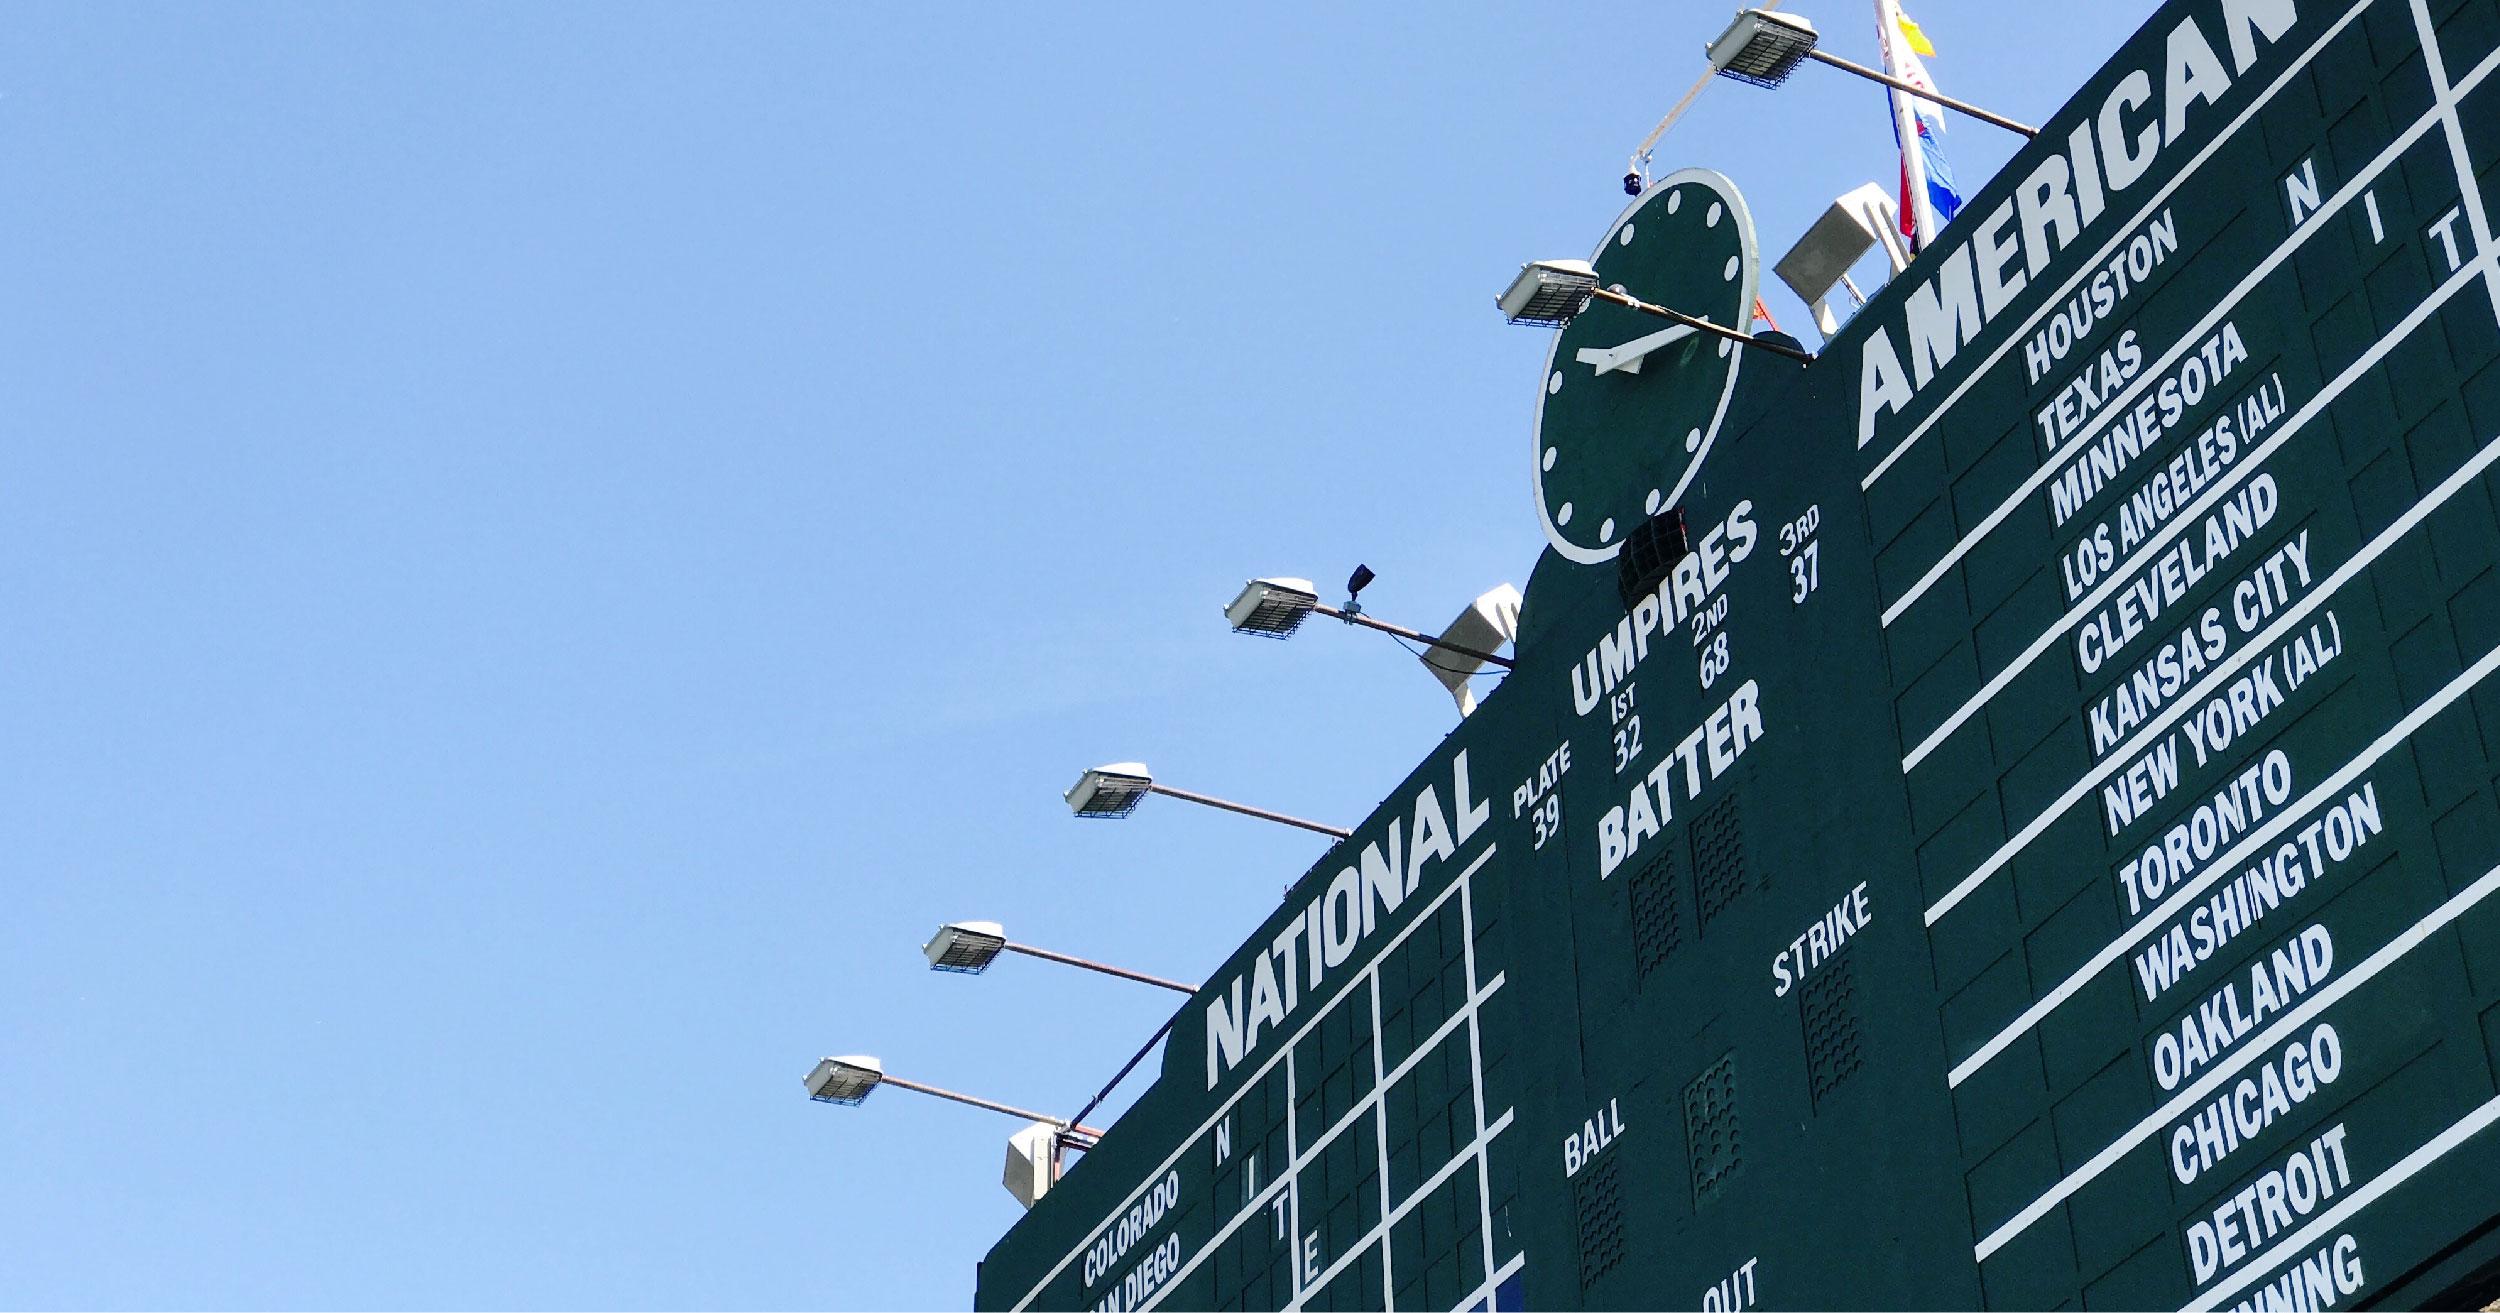 BaseballAnalyticsBlogImage